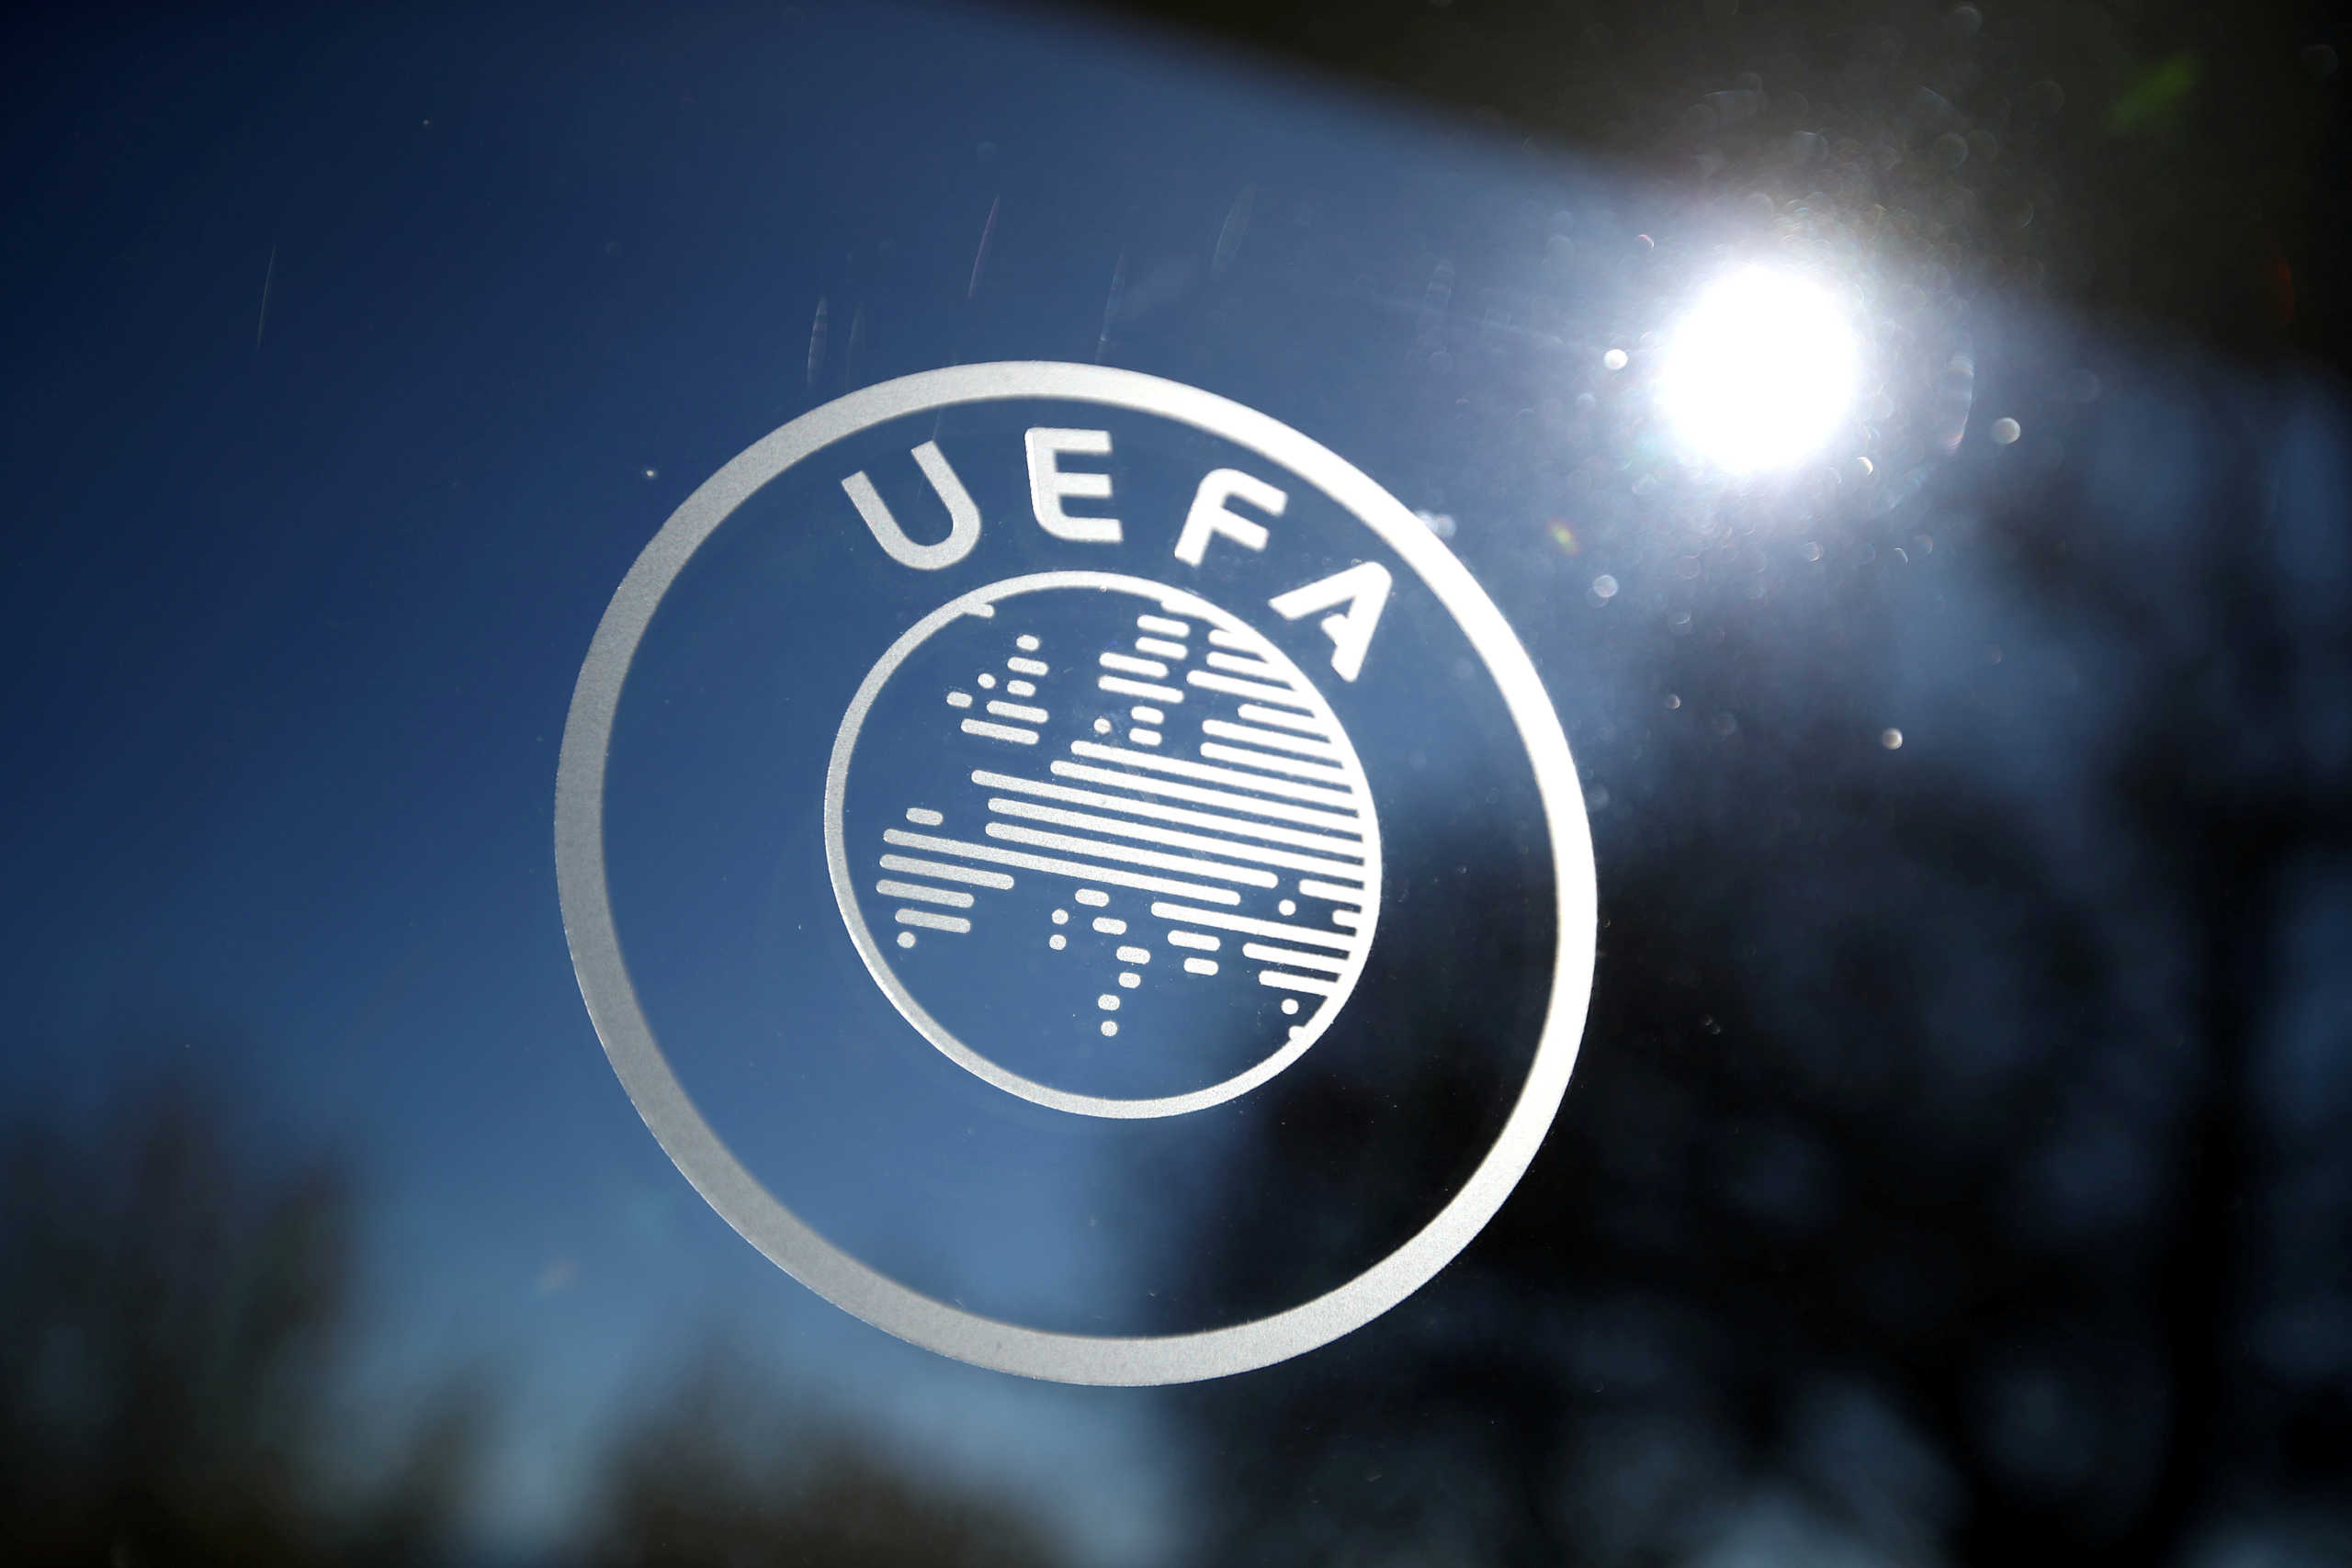 UEFA: Σκέψεις για αλλαγές στο Financial Fair Play